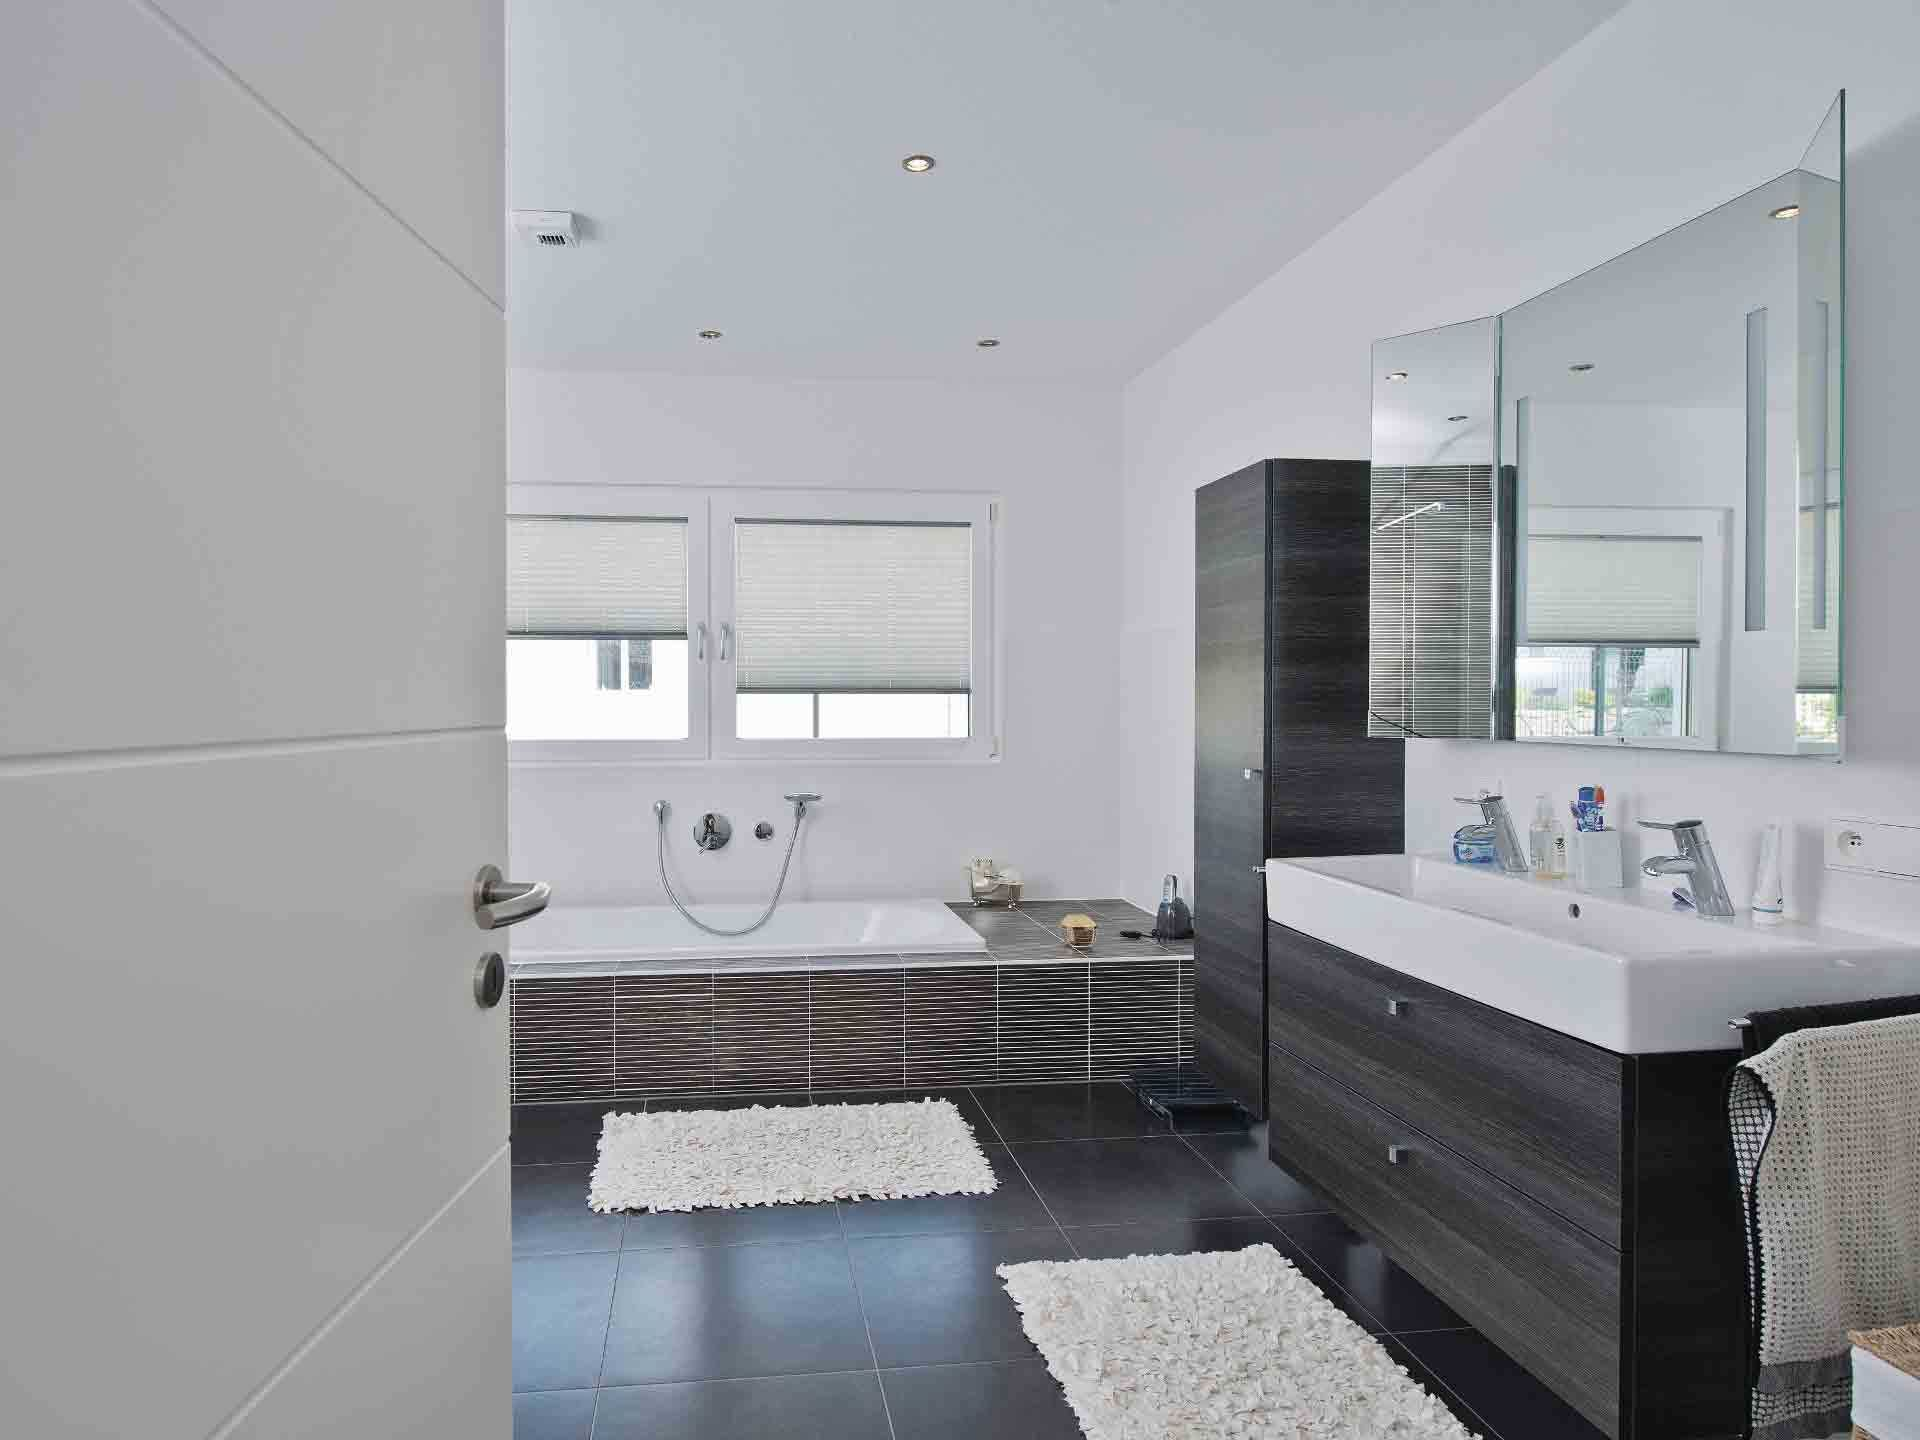 Luxusvilla Im Bauhaus Stil Weberhaus In 2020 Luxus Villa Weber Haus Kubus Haus